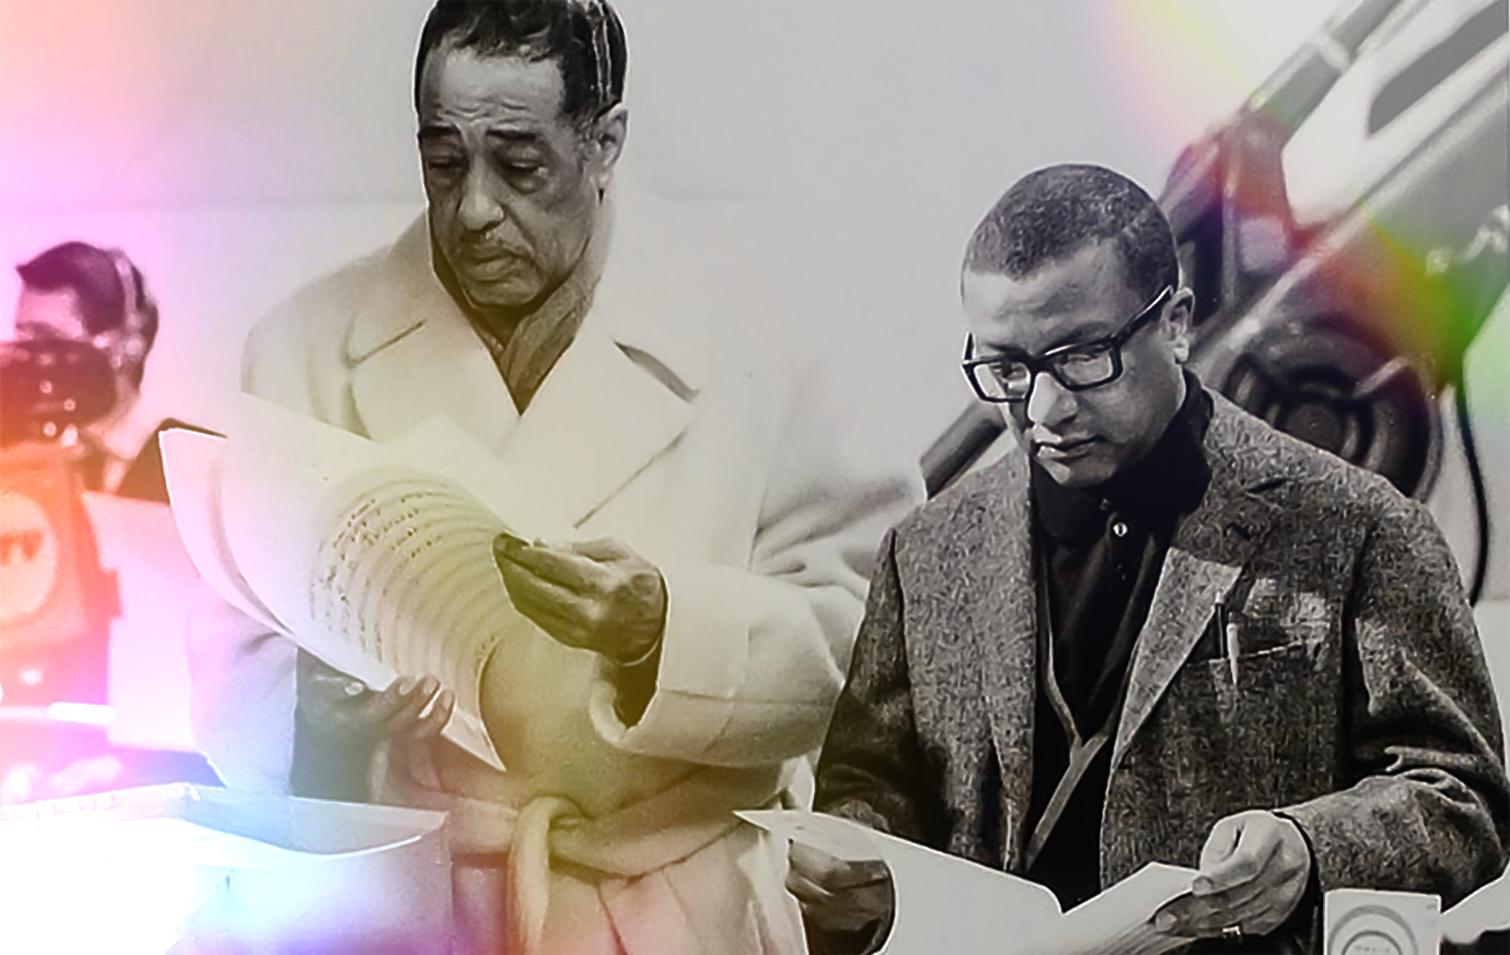 Duke Ellington and Billy Strayhorn